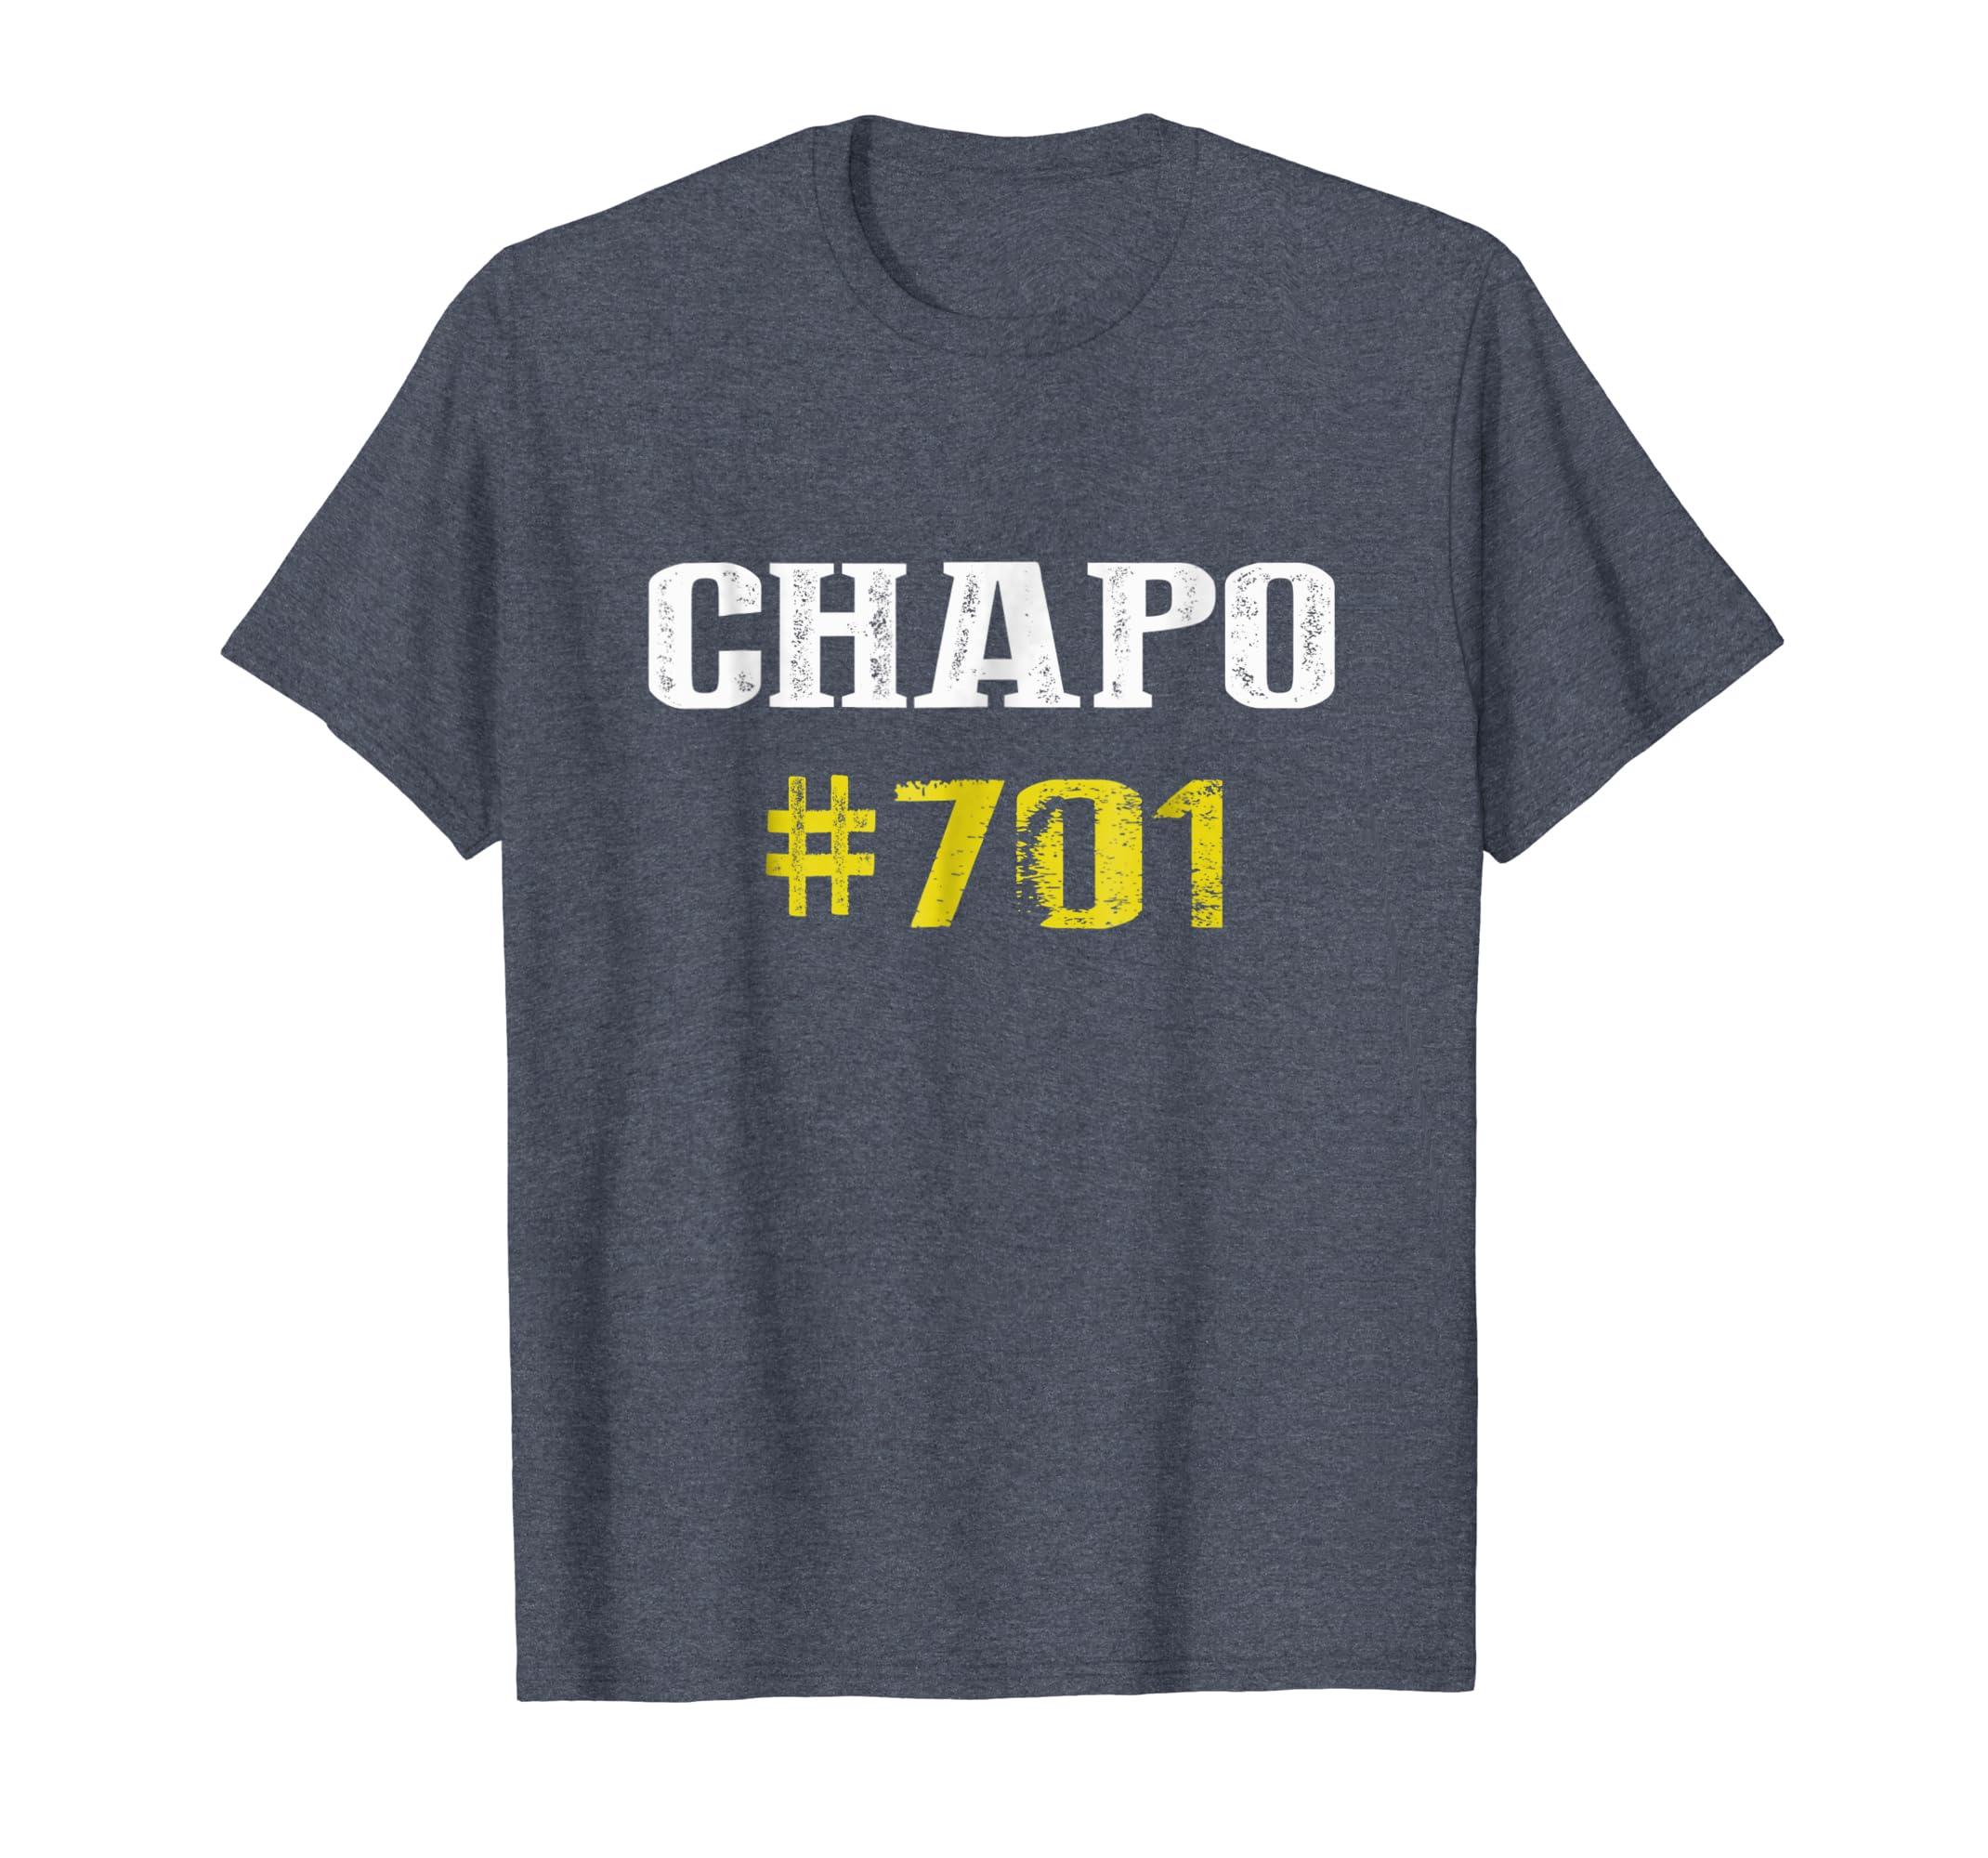 76988646924 El chapo billionaire shirt funny clothing png 2140x2000 Chapo guzman  sinaloa cartel 701 cartoon